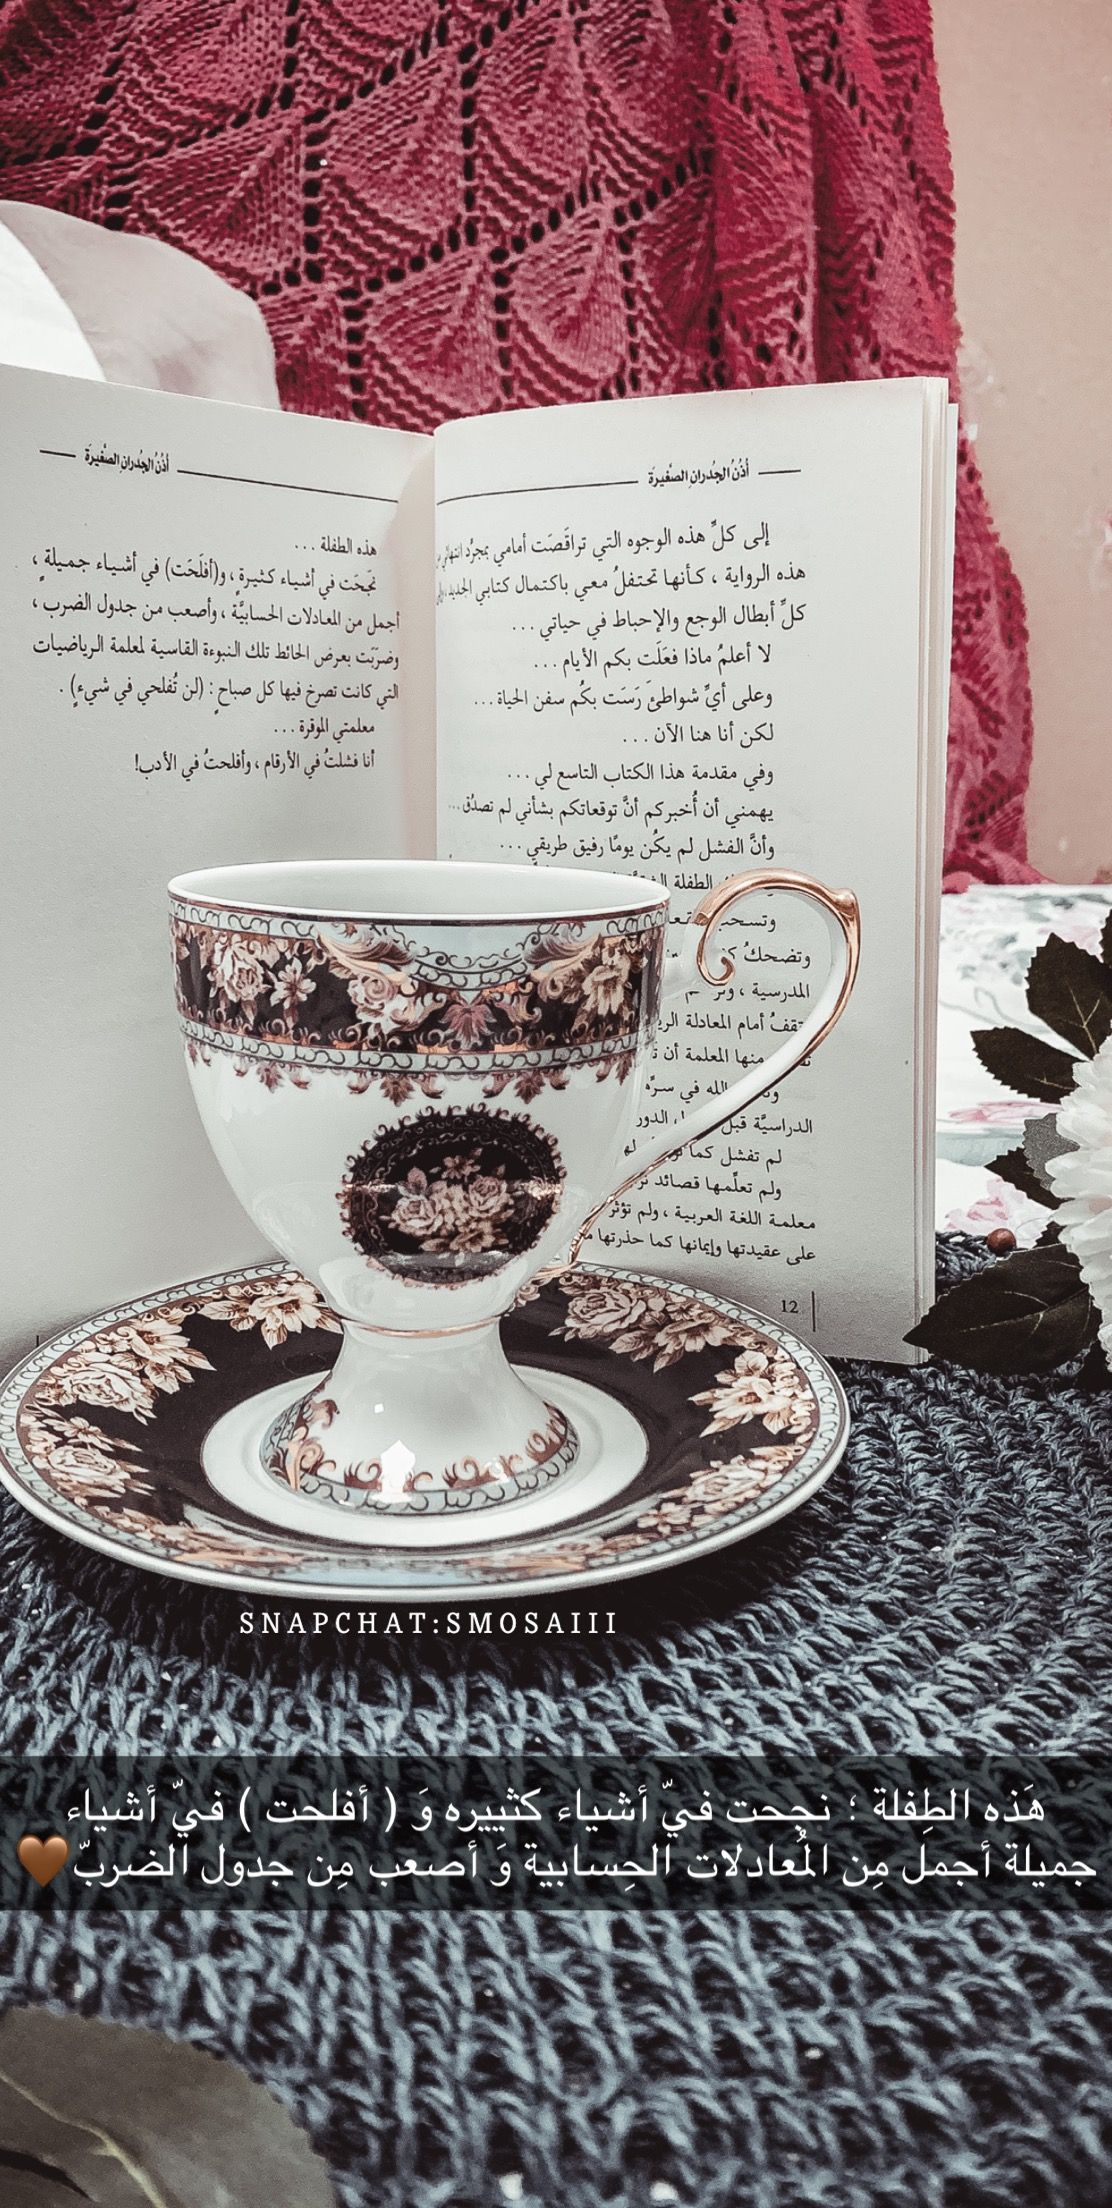 Snap Smosaiii Insta Smosaii Beautiful Arabic Words Arabic Quotes Stylish Girls Photos